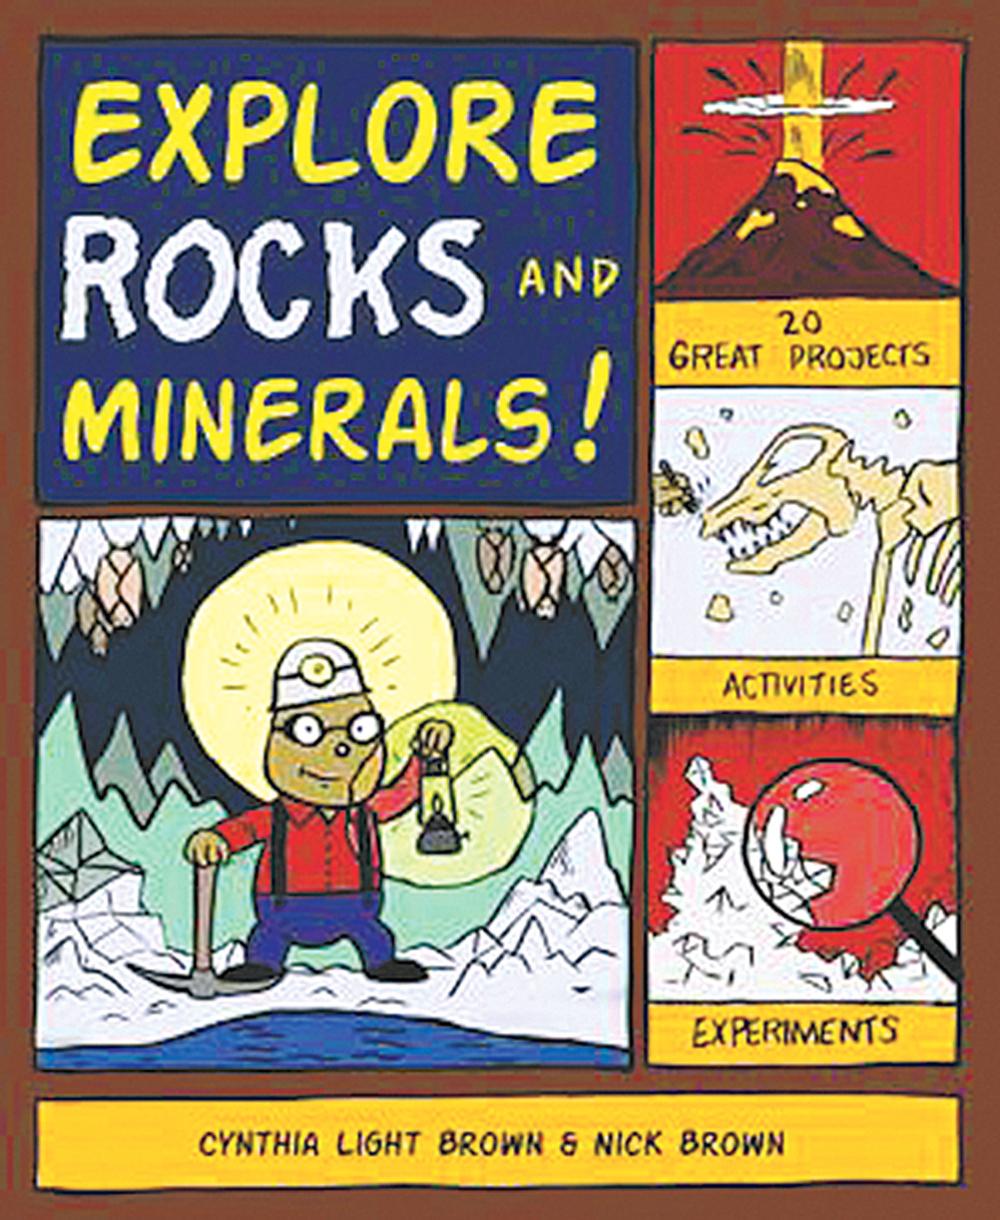 Explore Rocks and Minerals! 20 Projects, Activities, Experiments